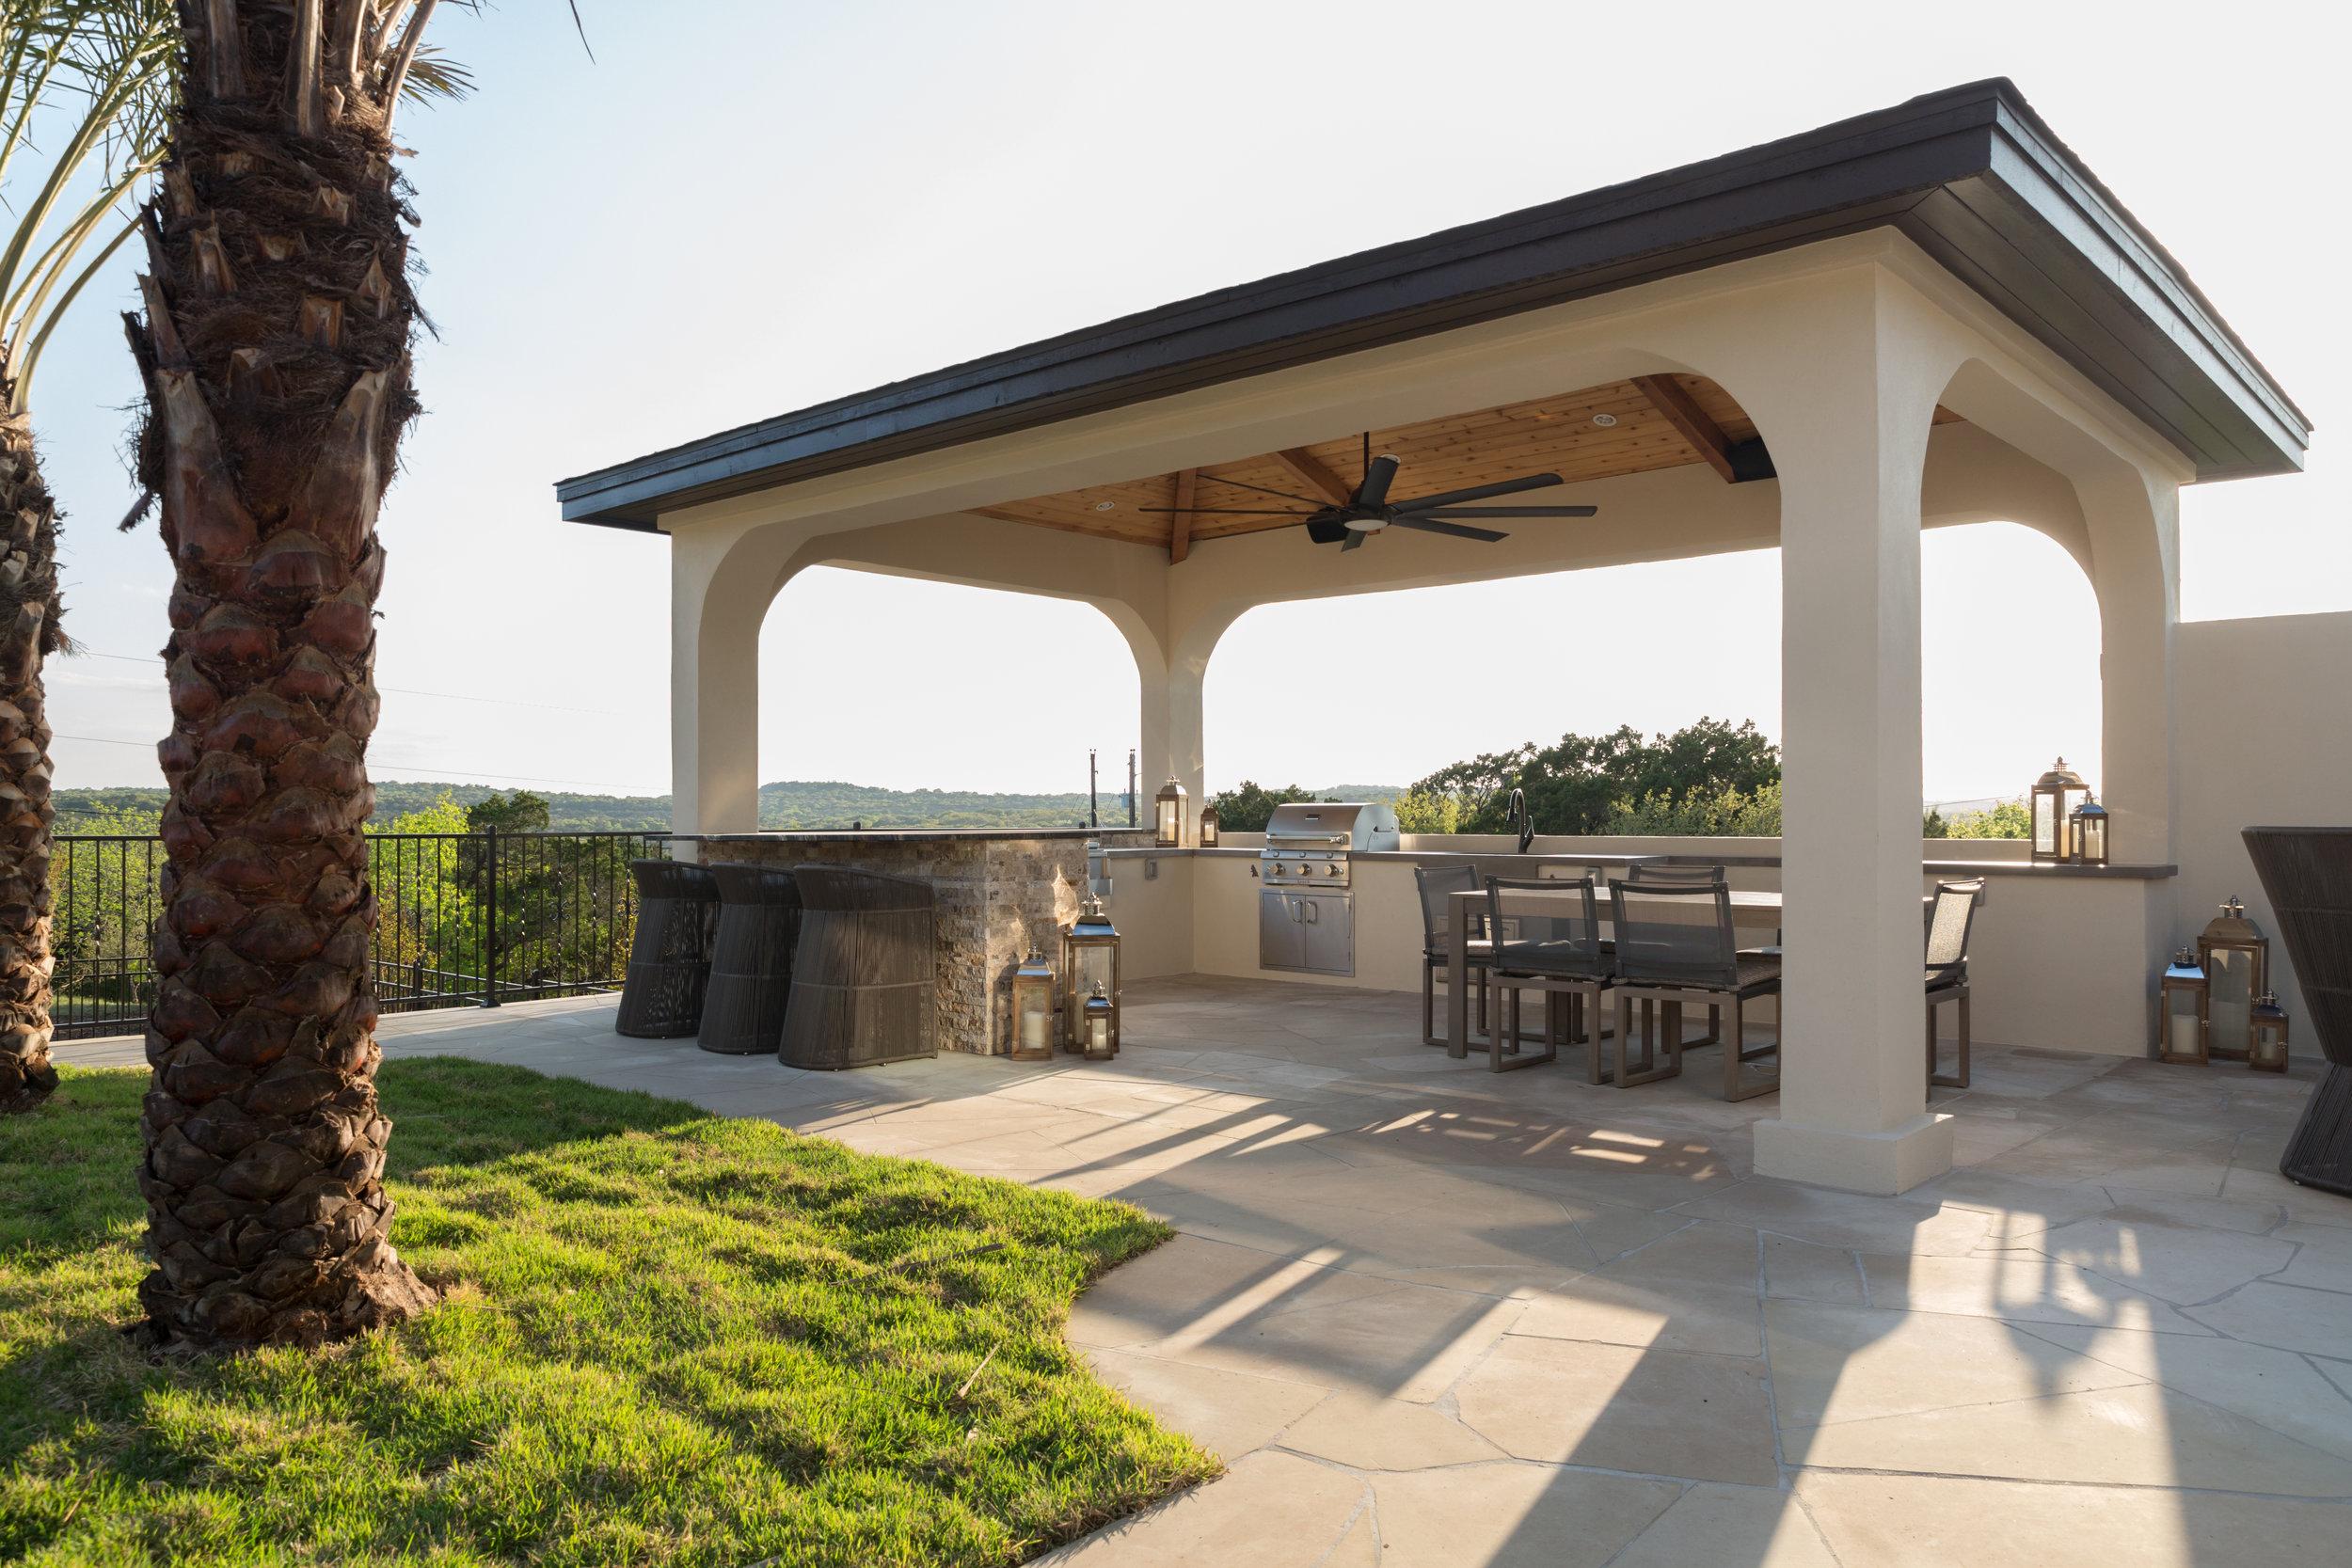 Cabana Bar and Large Table